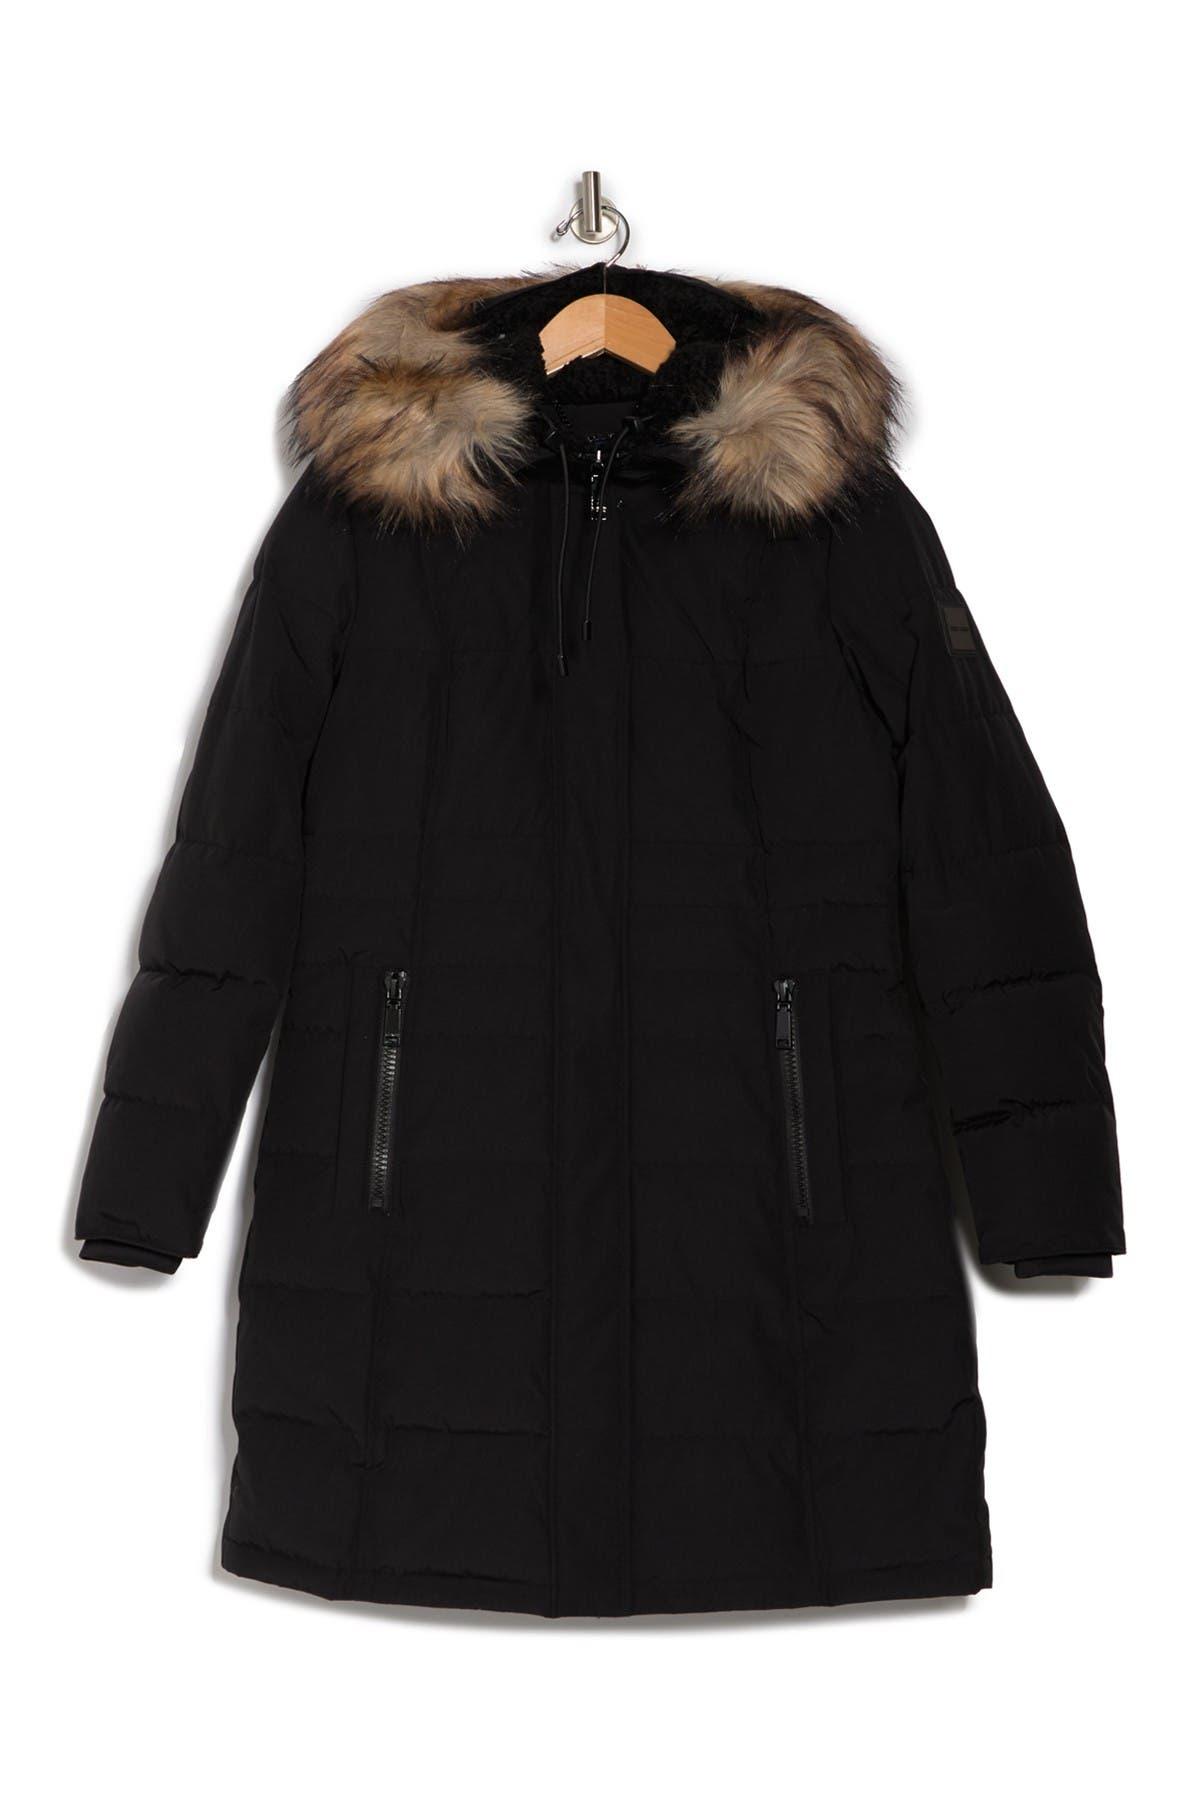 Nine West Faux Shearling & Faux Fur Trim Hooded Puffer Parka